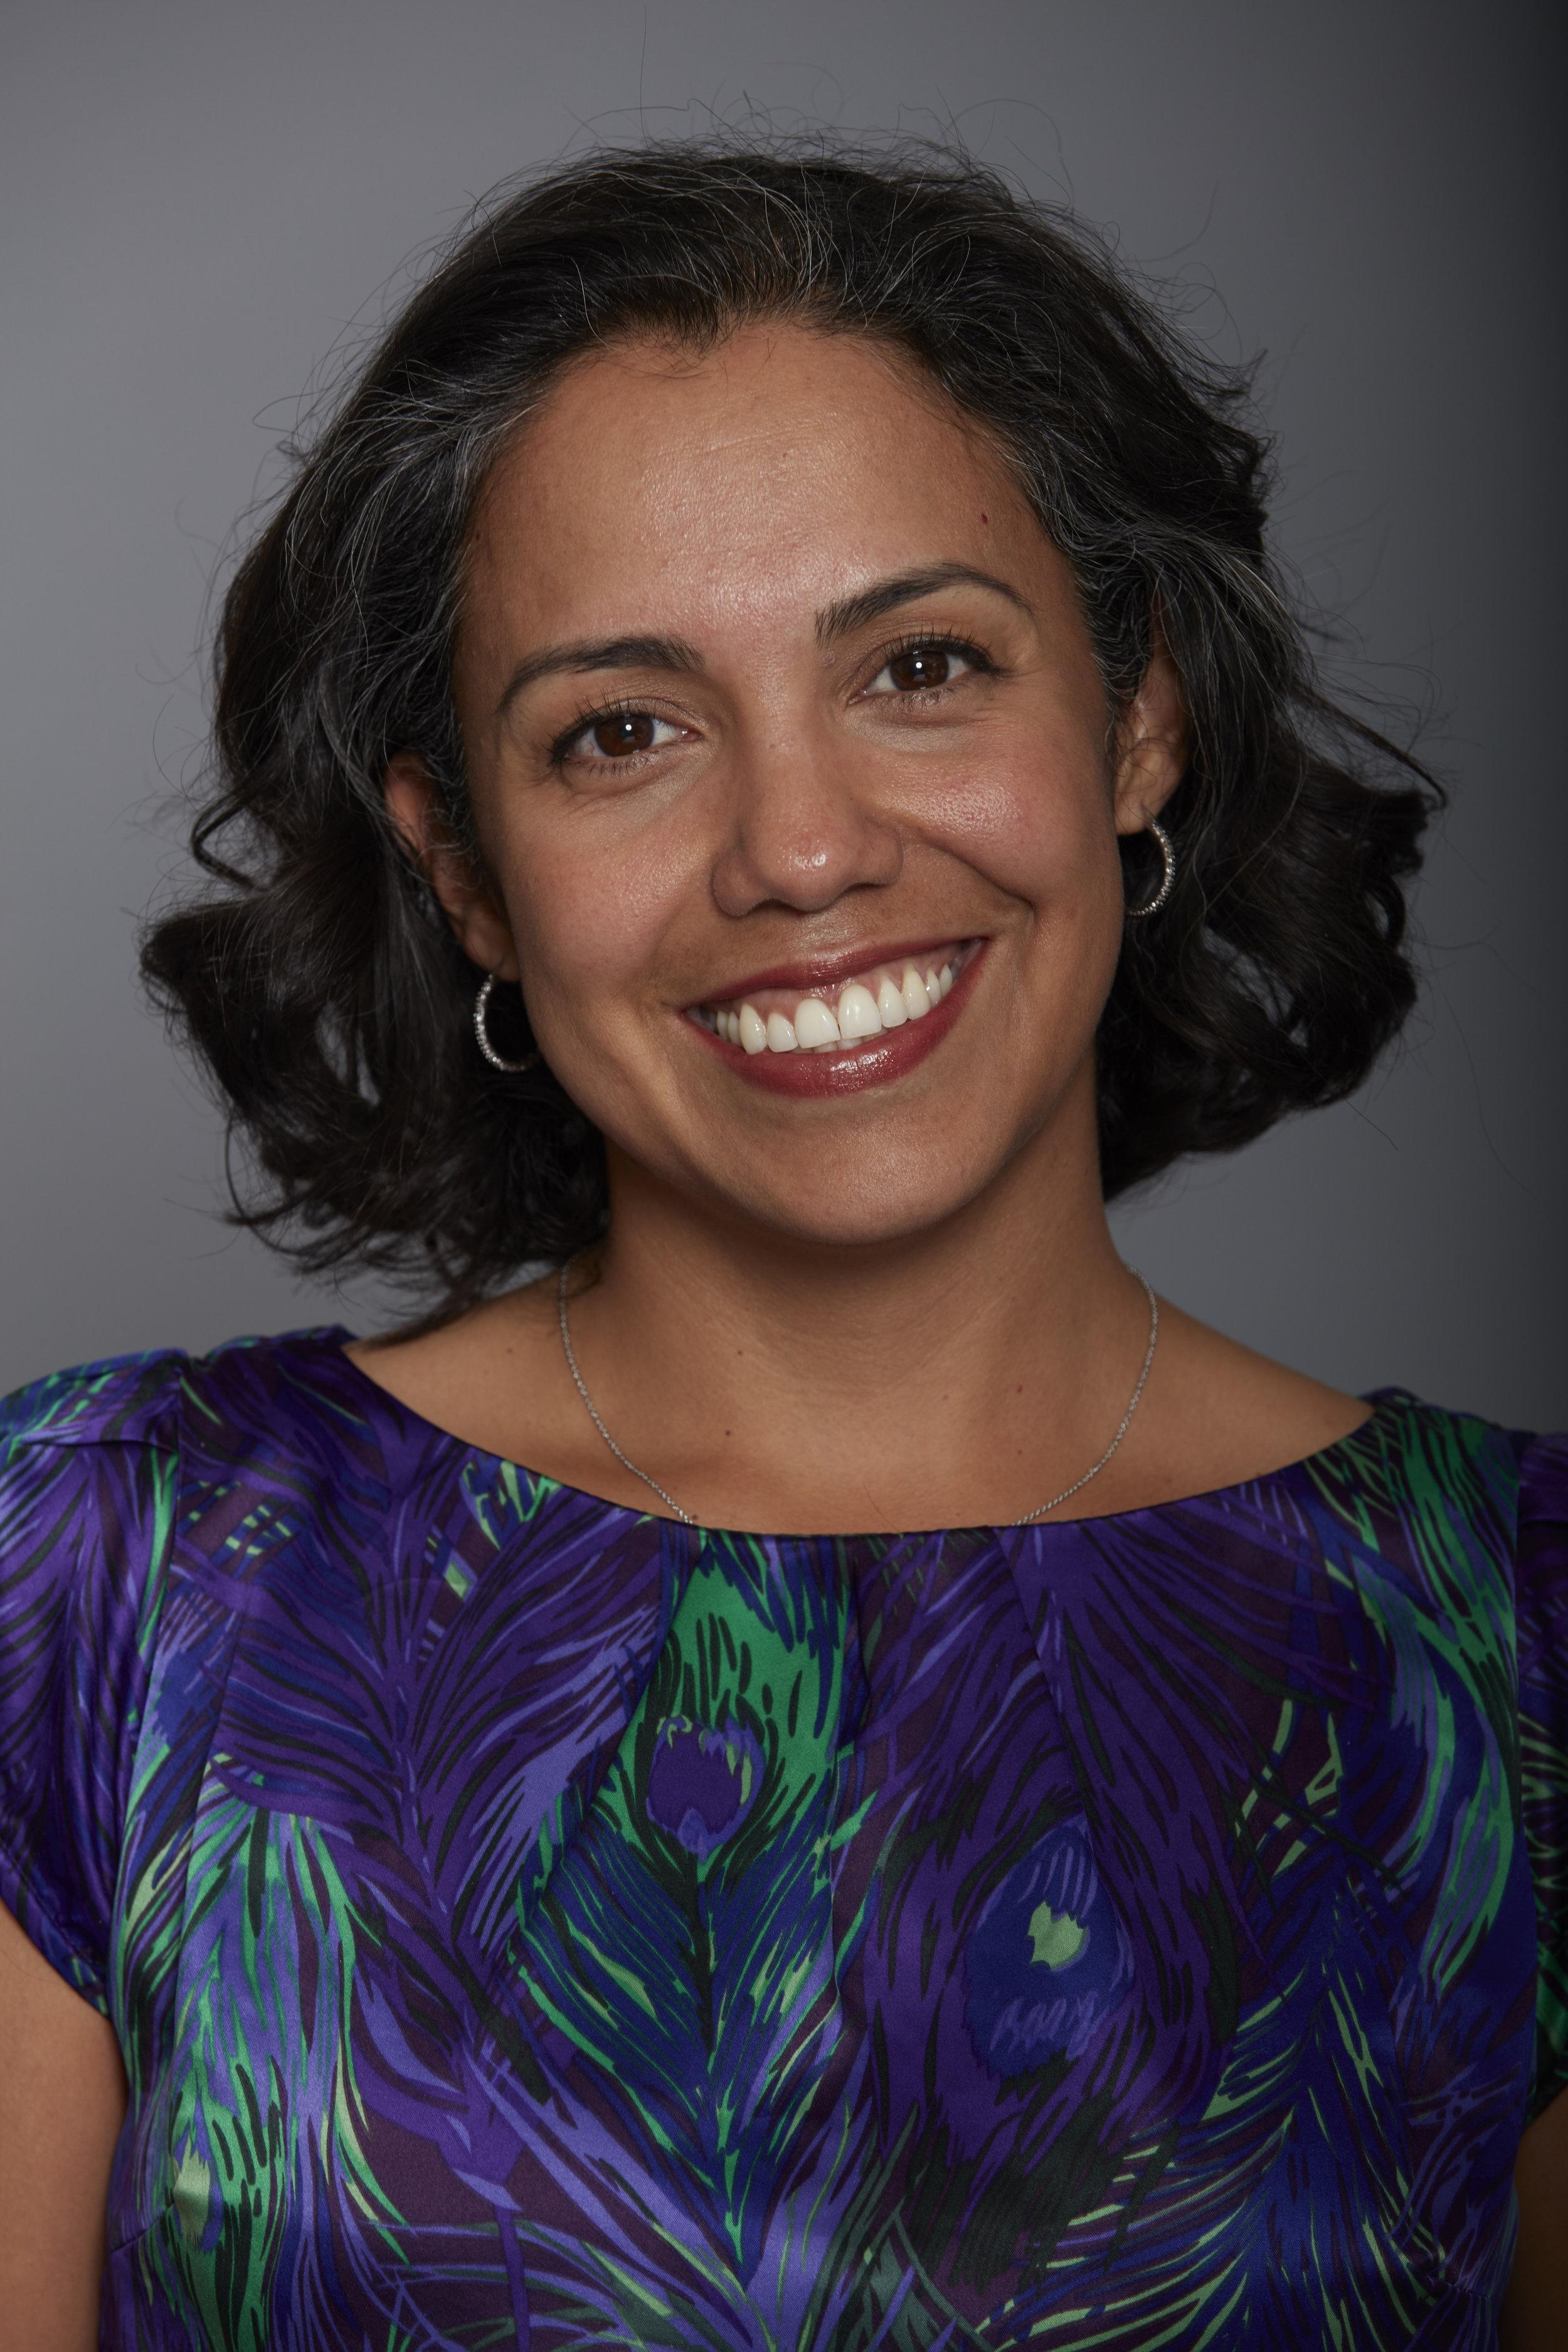 Margarita Luna  is the Senior Program Manager, Eastern Coachella Valley at The California Endowment